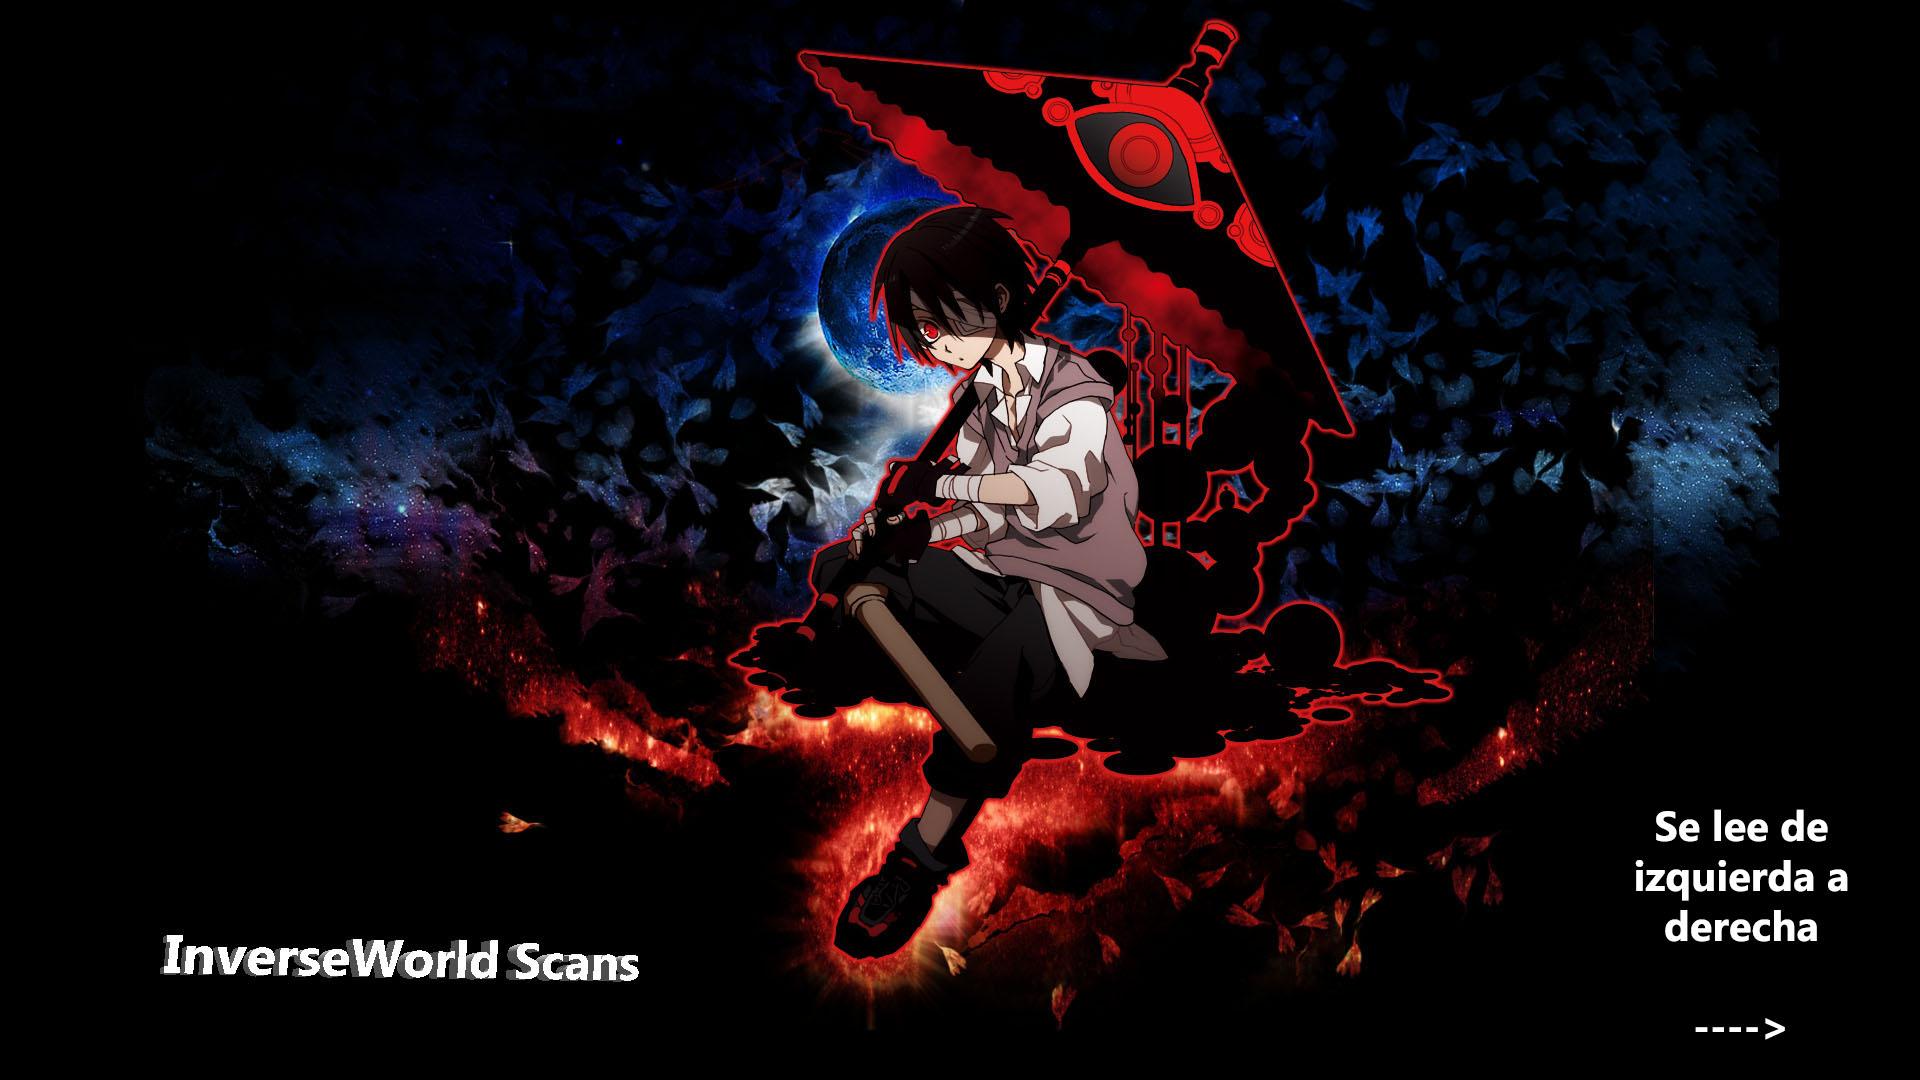 http://c5.ninemanga.com/es_manga/18/16210/415302/da728da5cd155a5b9474508d12ee0862.jpg Page 2